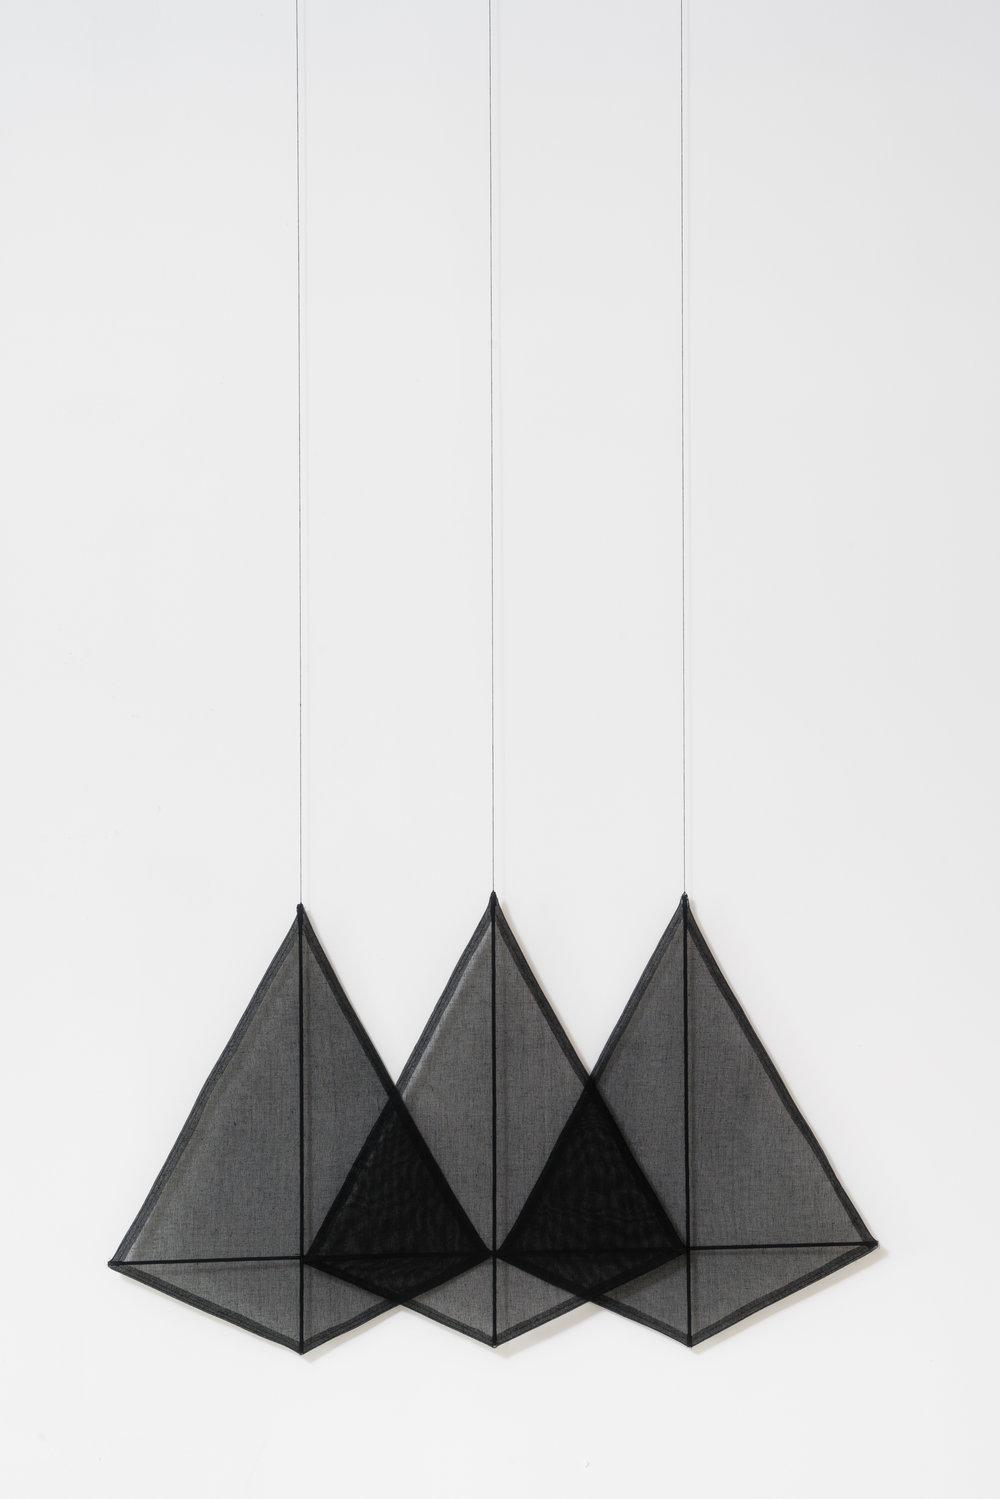 Black Kites, 2017